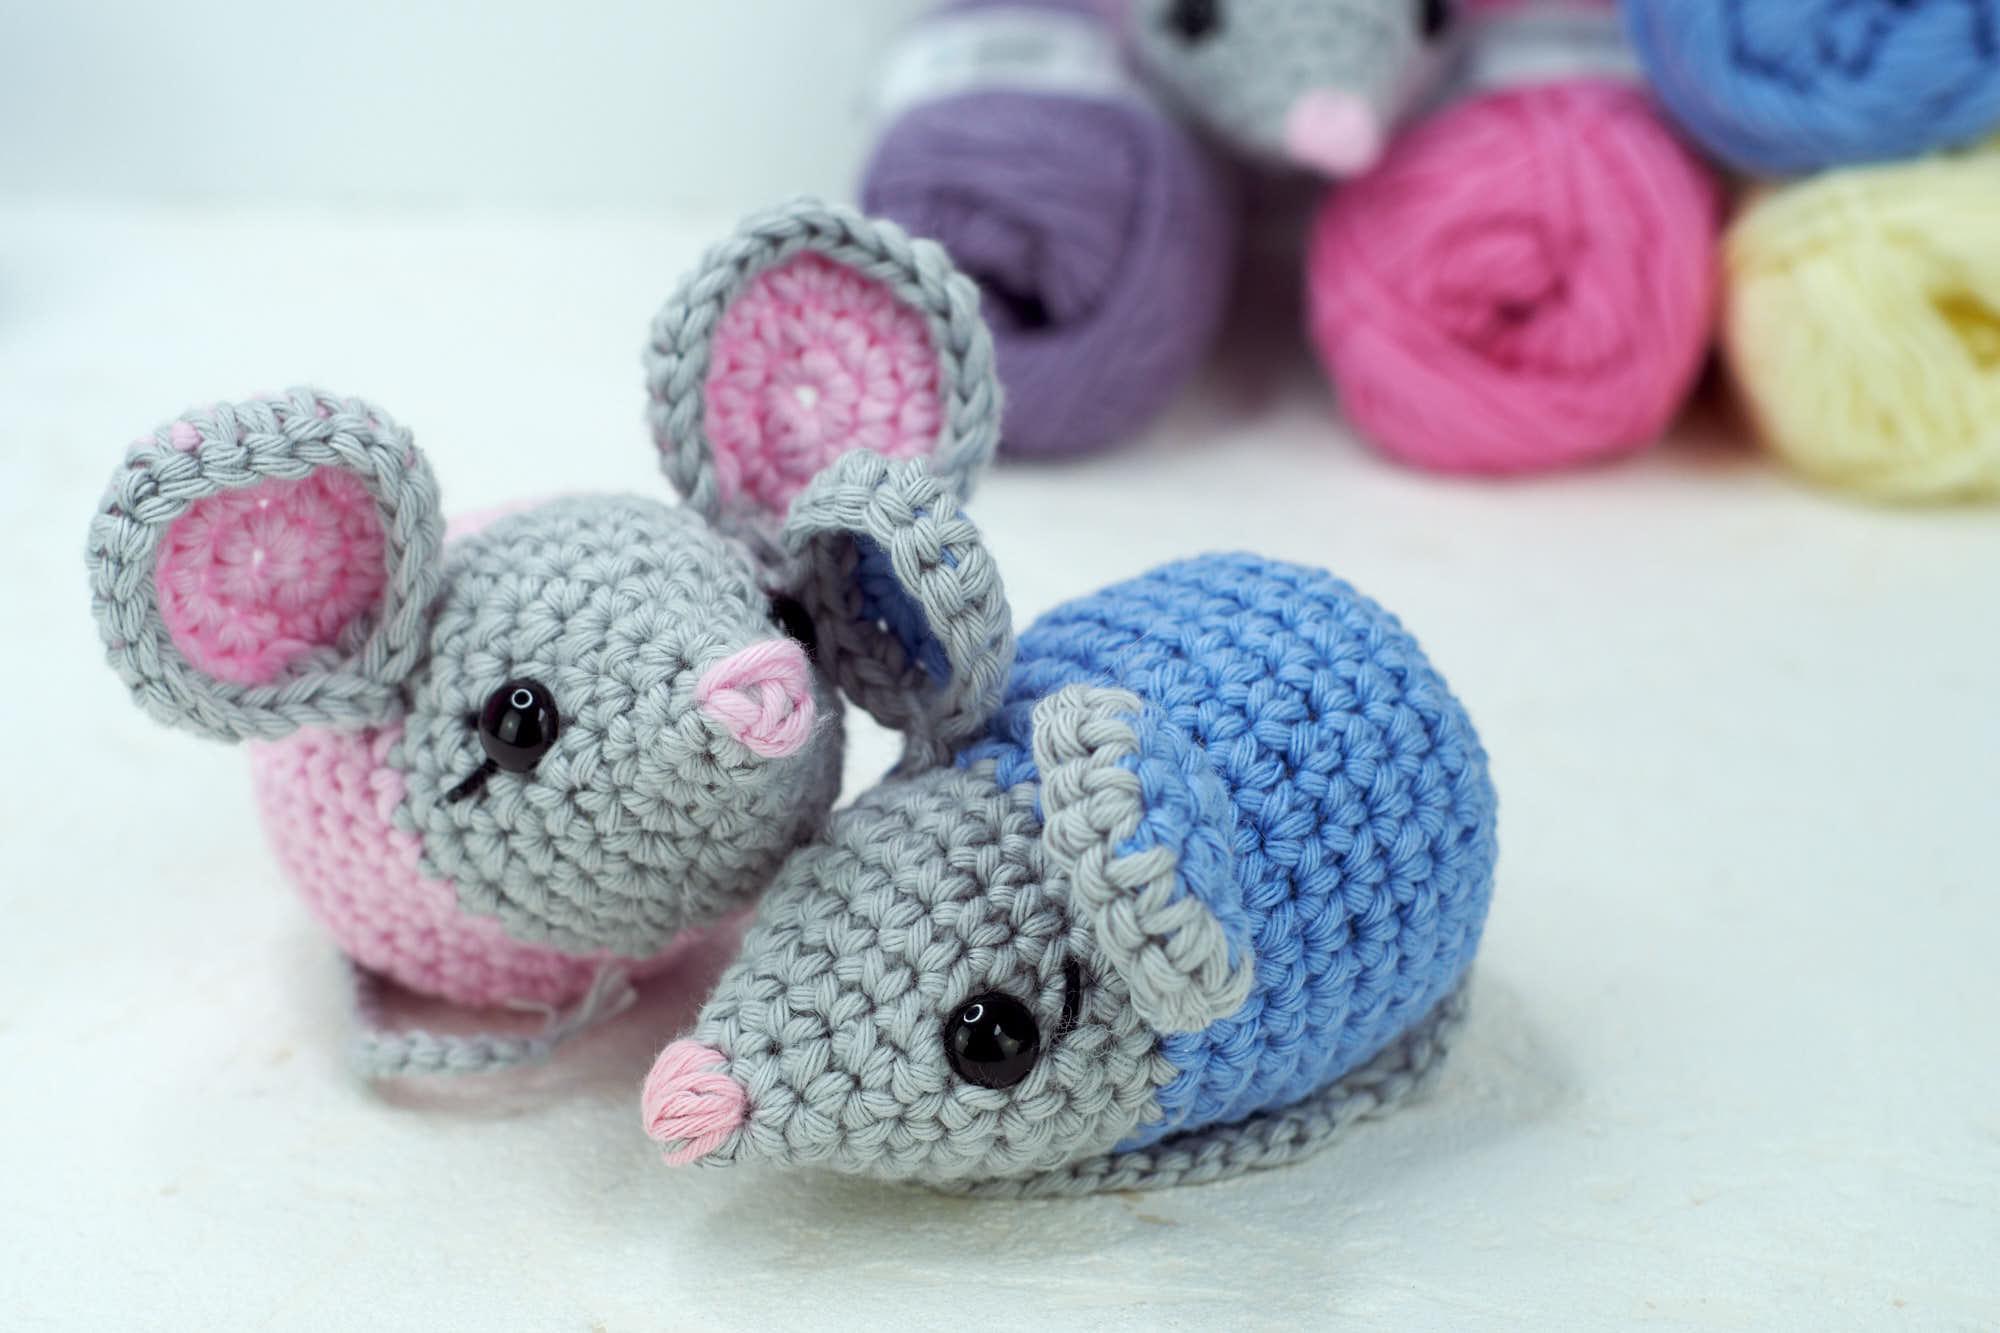 Amigurumi mouse crochet pattern | 1333x2000